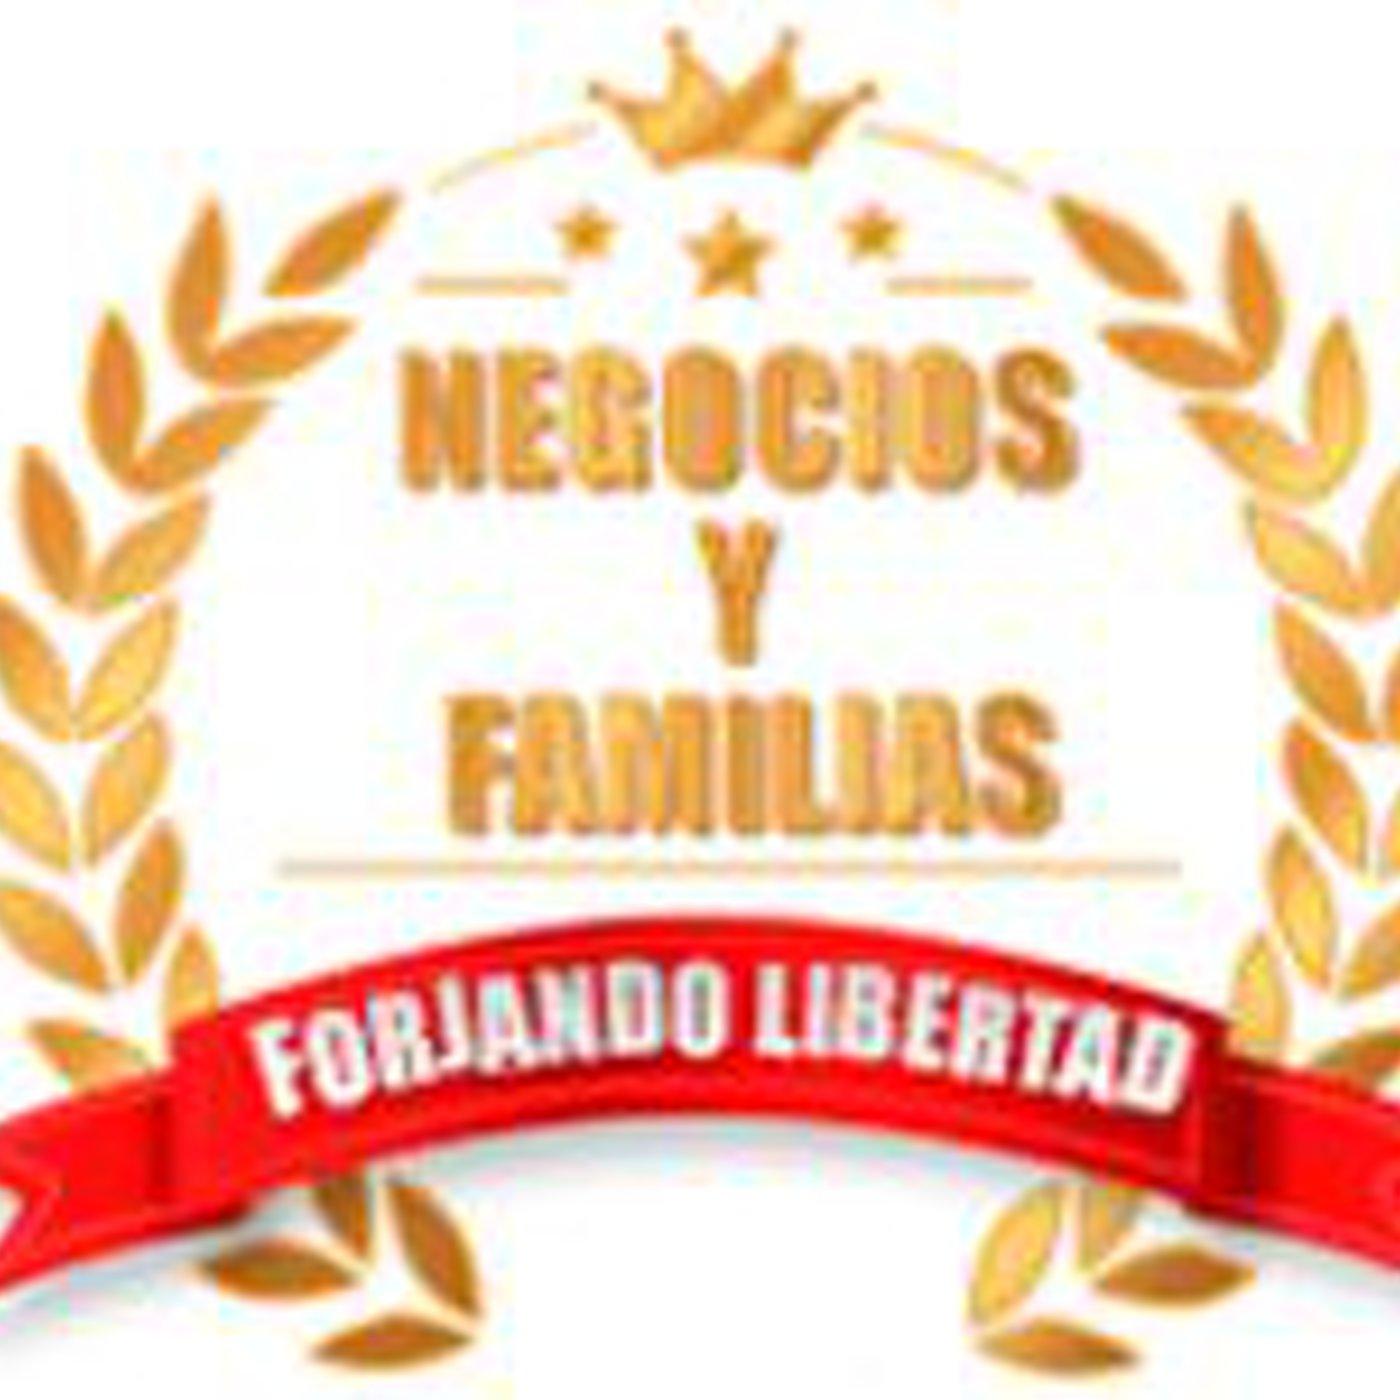 Lourdes Enriquez - Rompe tus malos habitos